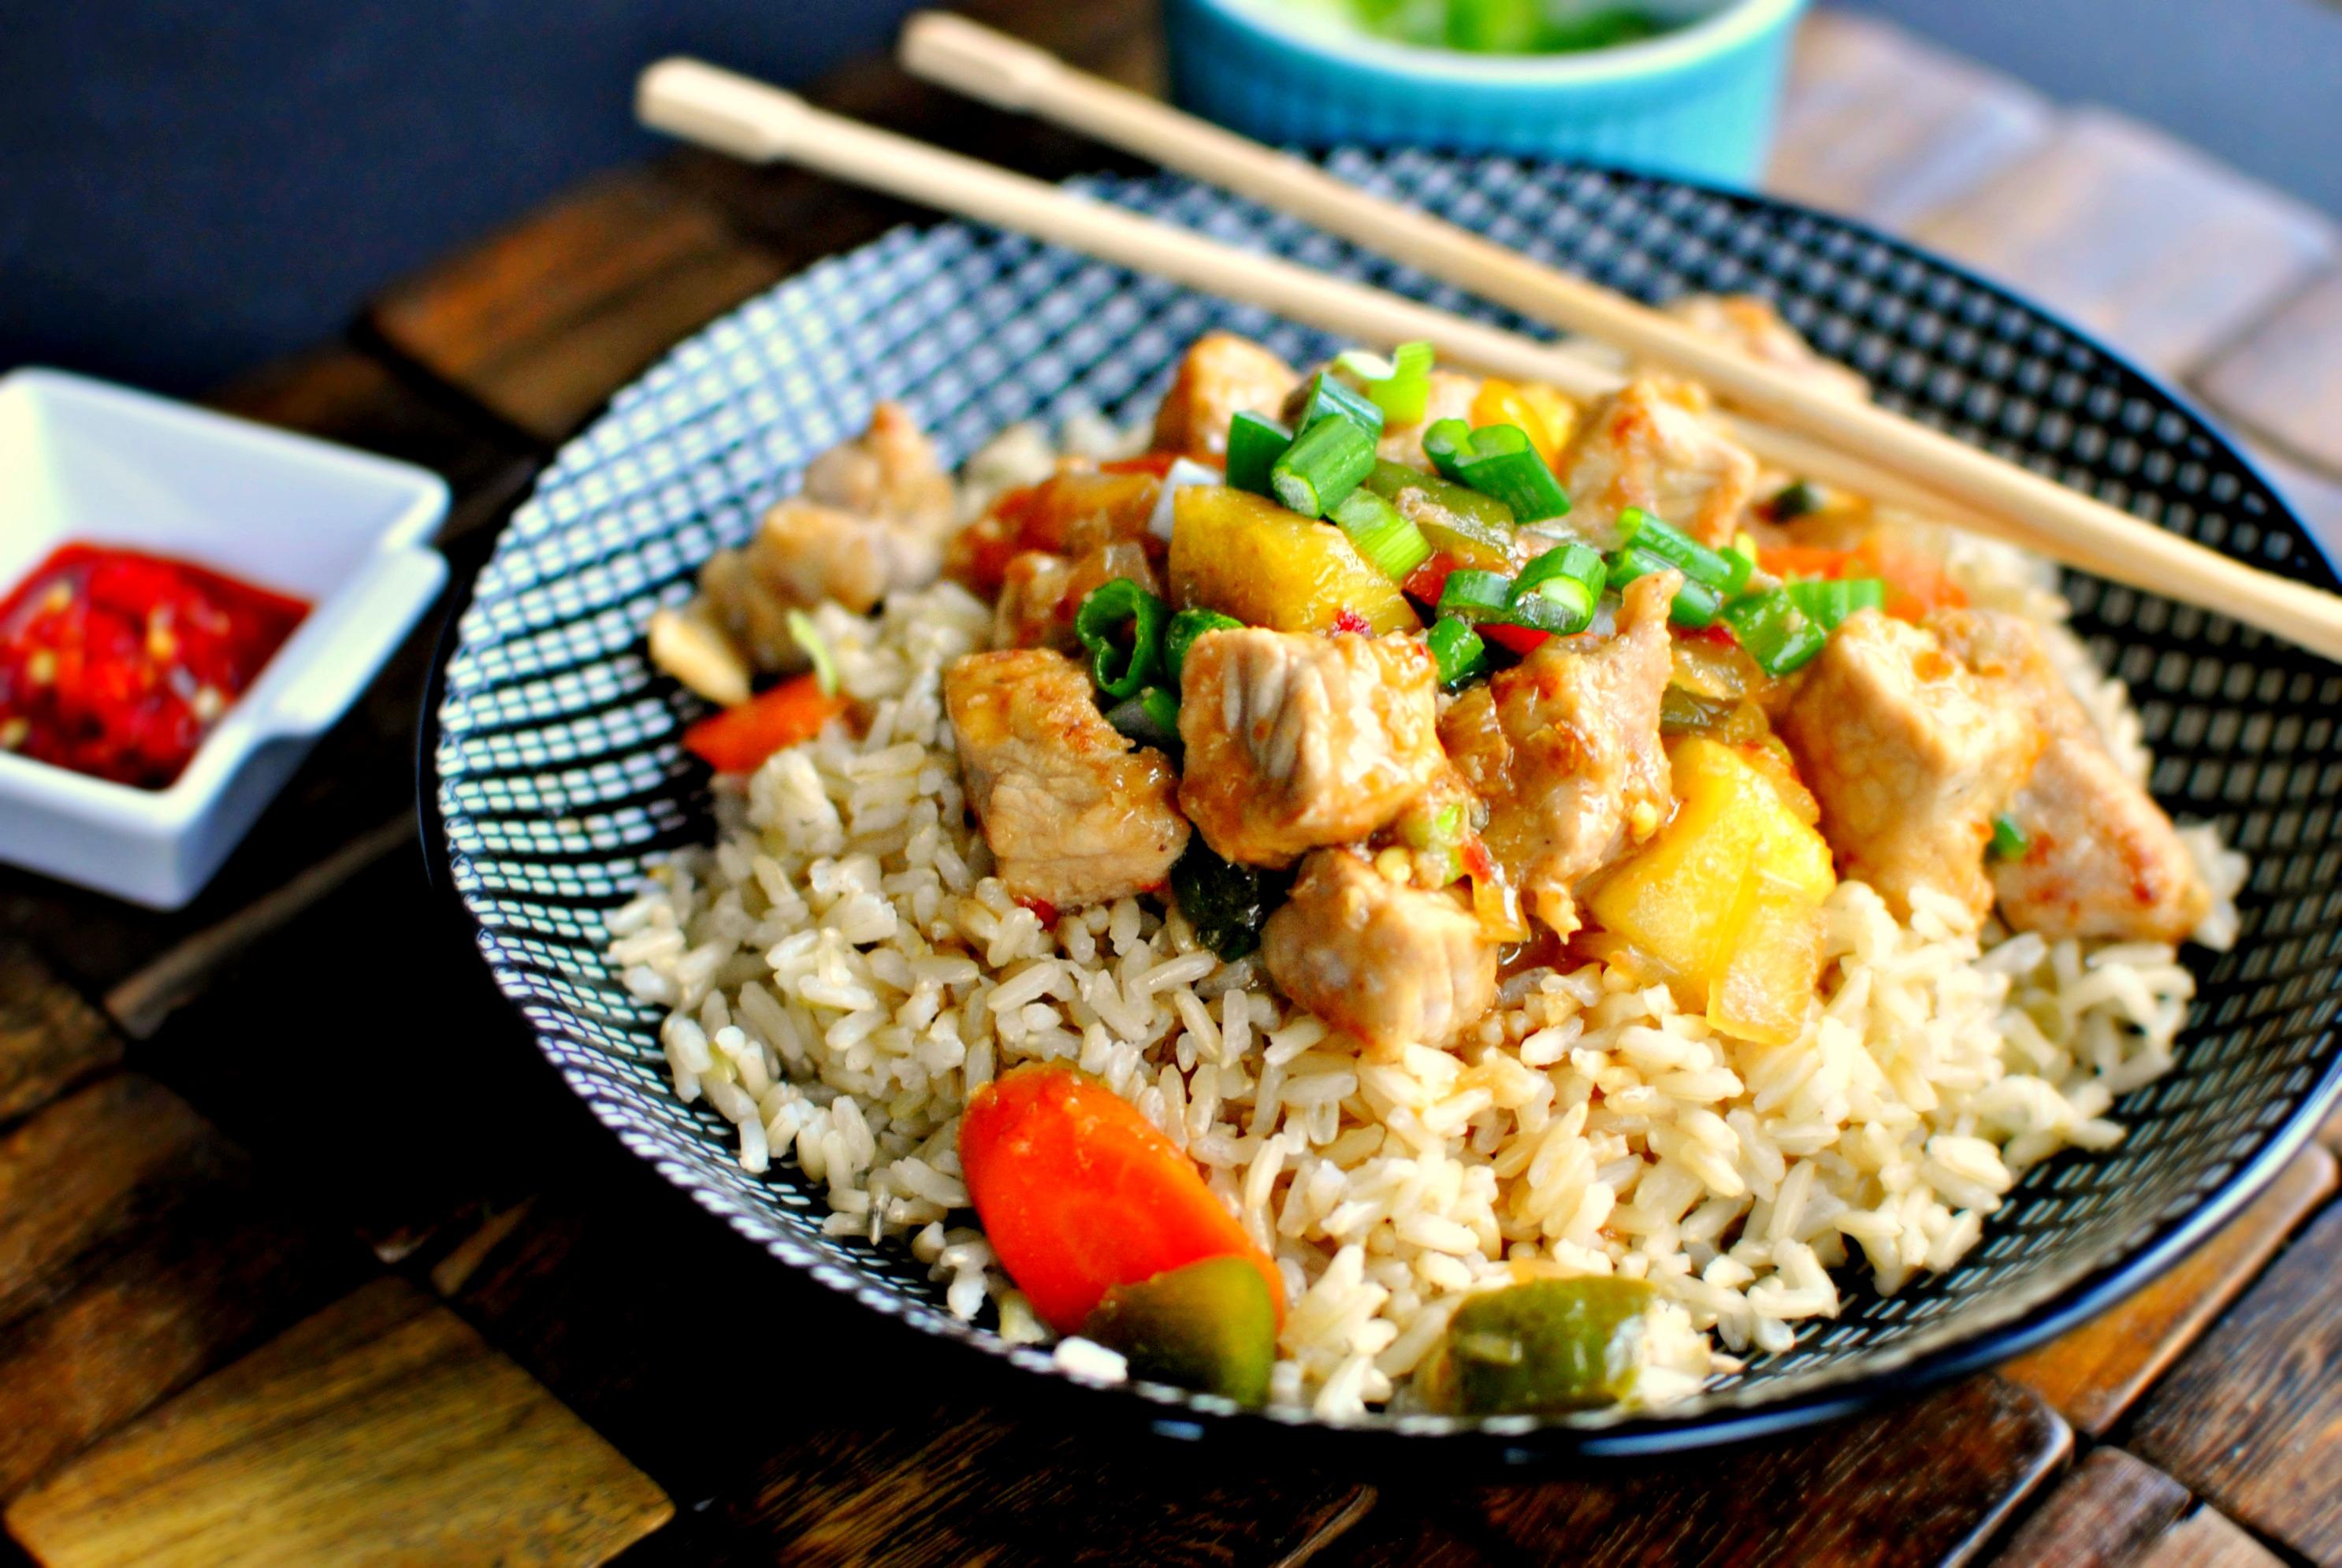 Pork Stir Fry With Green Onion Recipes — Dishmaps